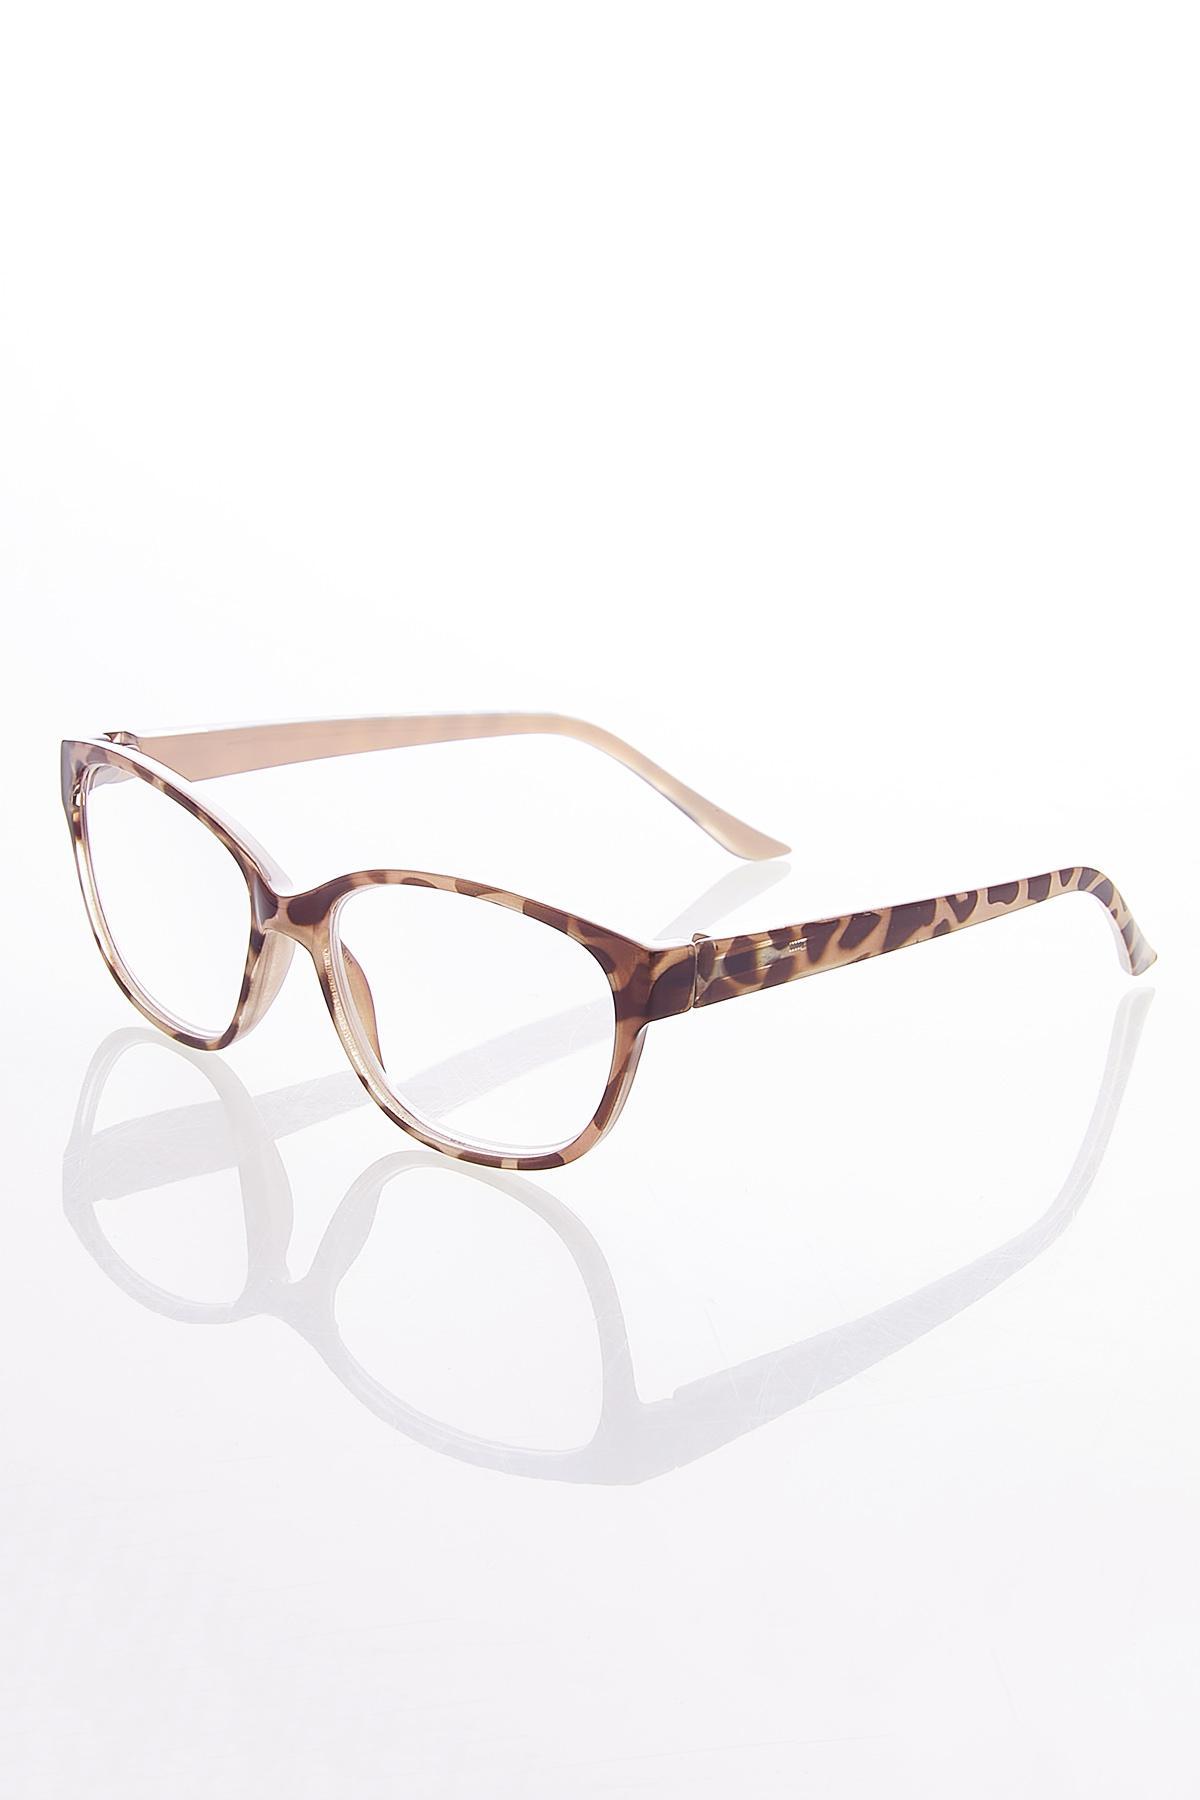 Pink Tortoise Reader Glasses (Item #44629835)